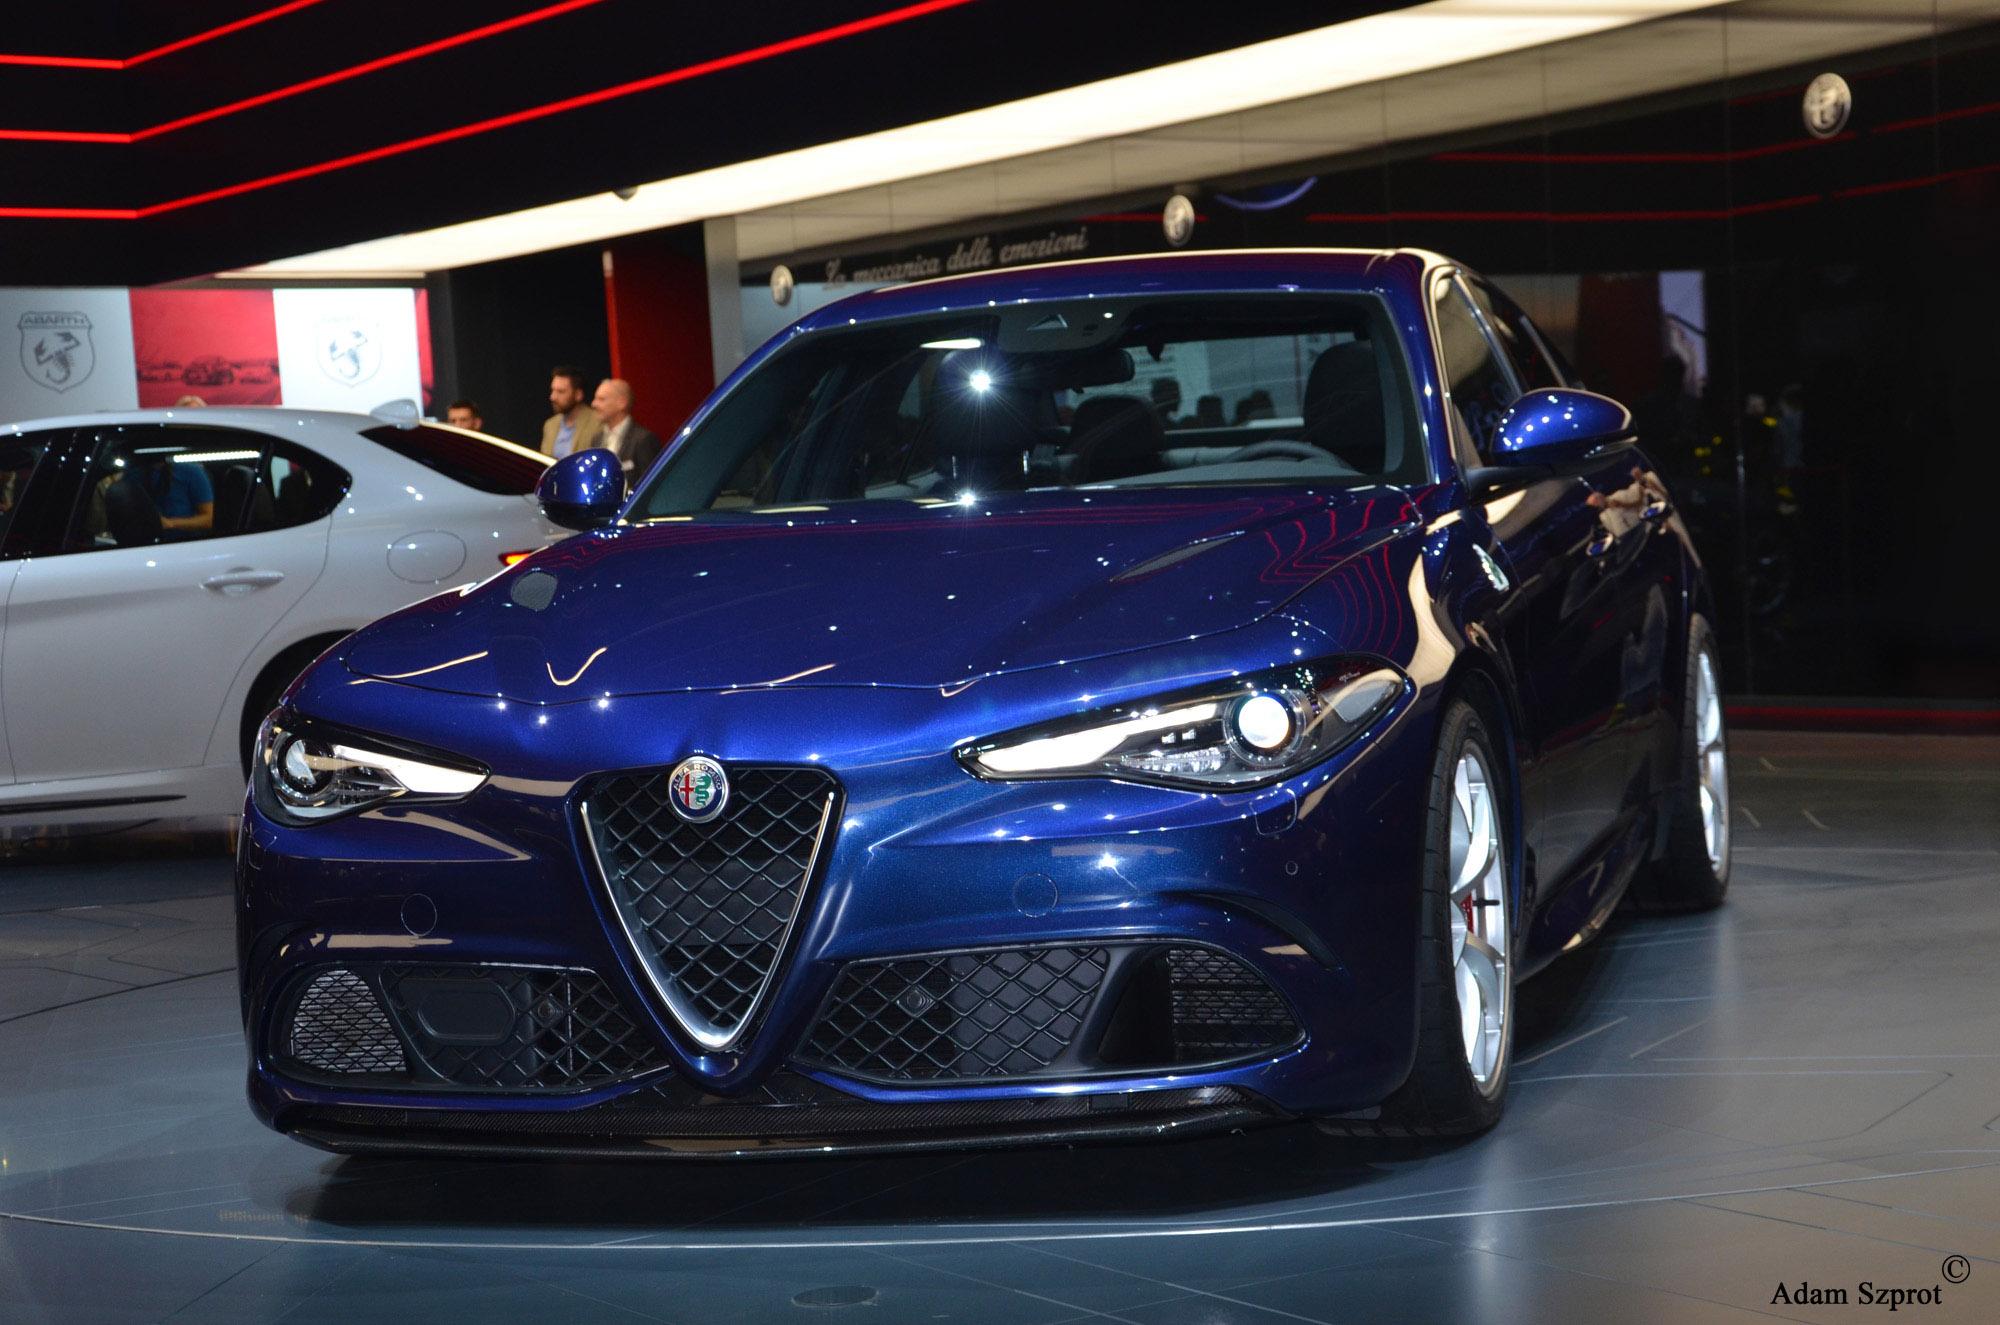 Alfa Romeo Giulia premiera 3dosetki